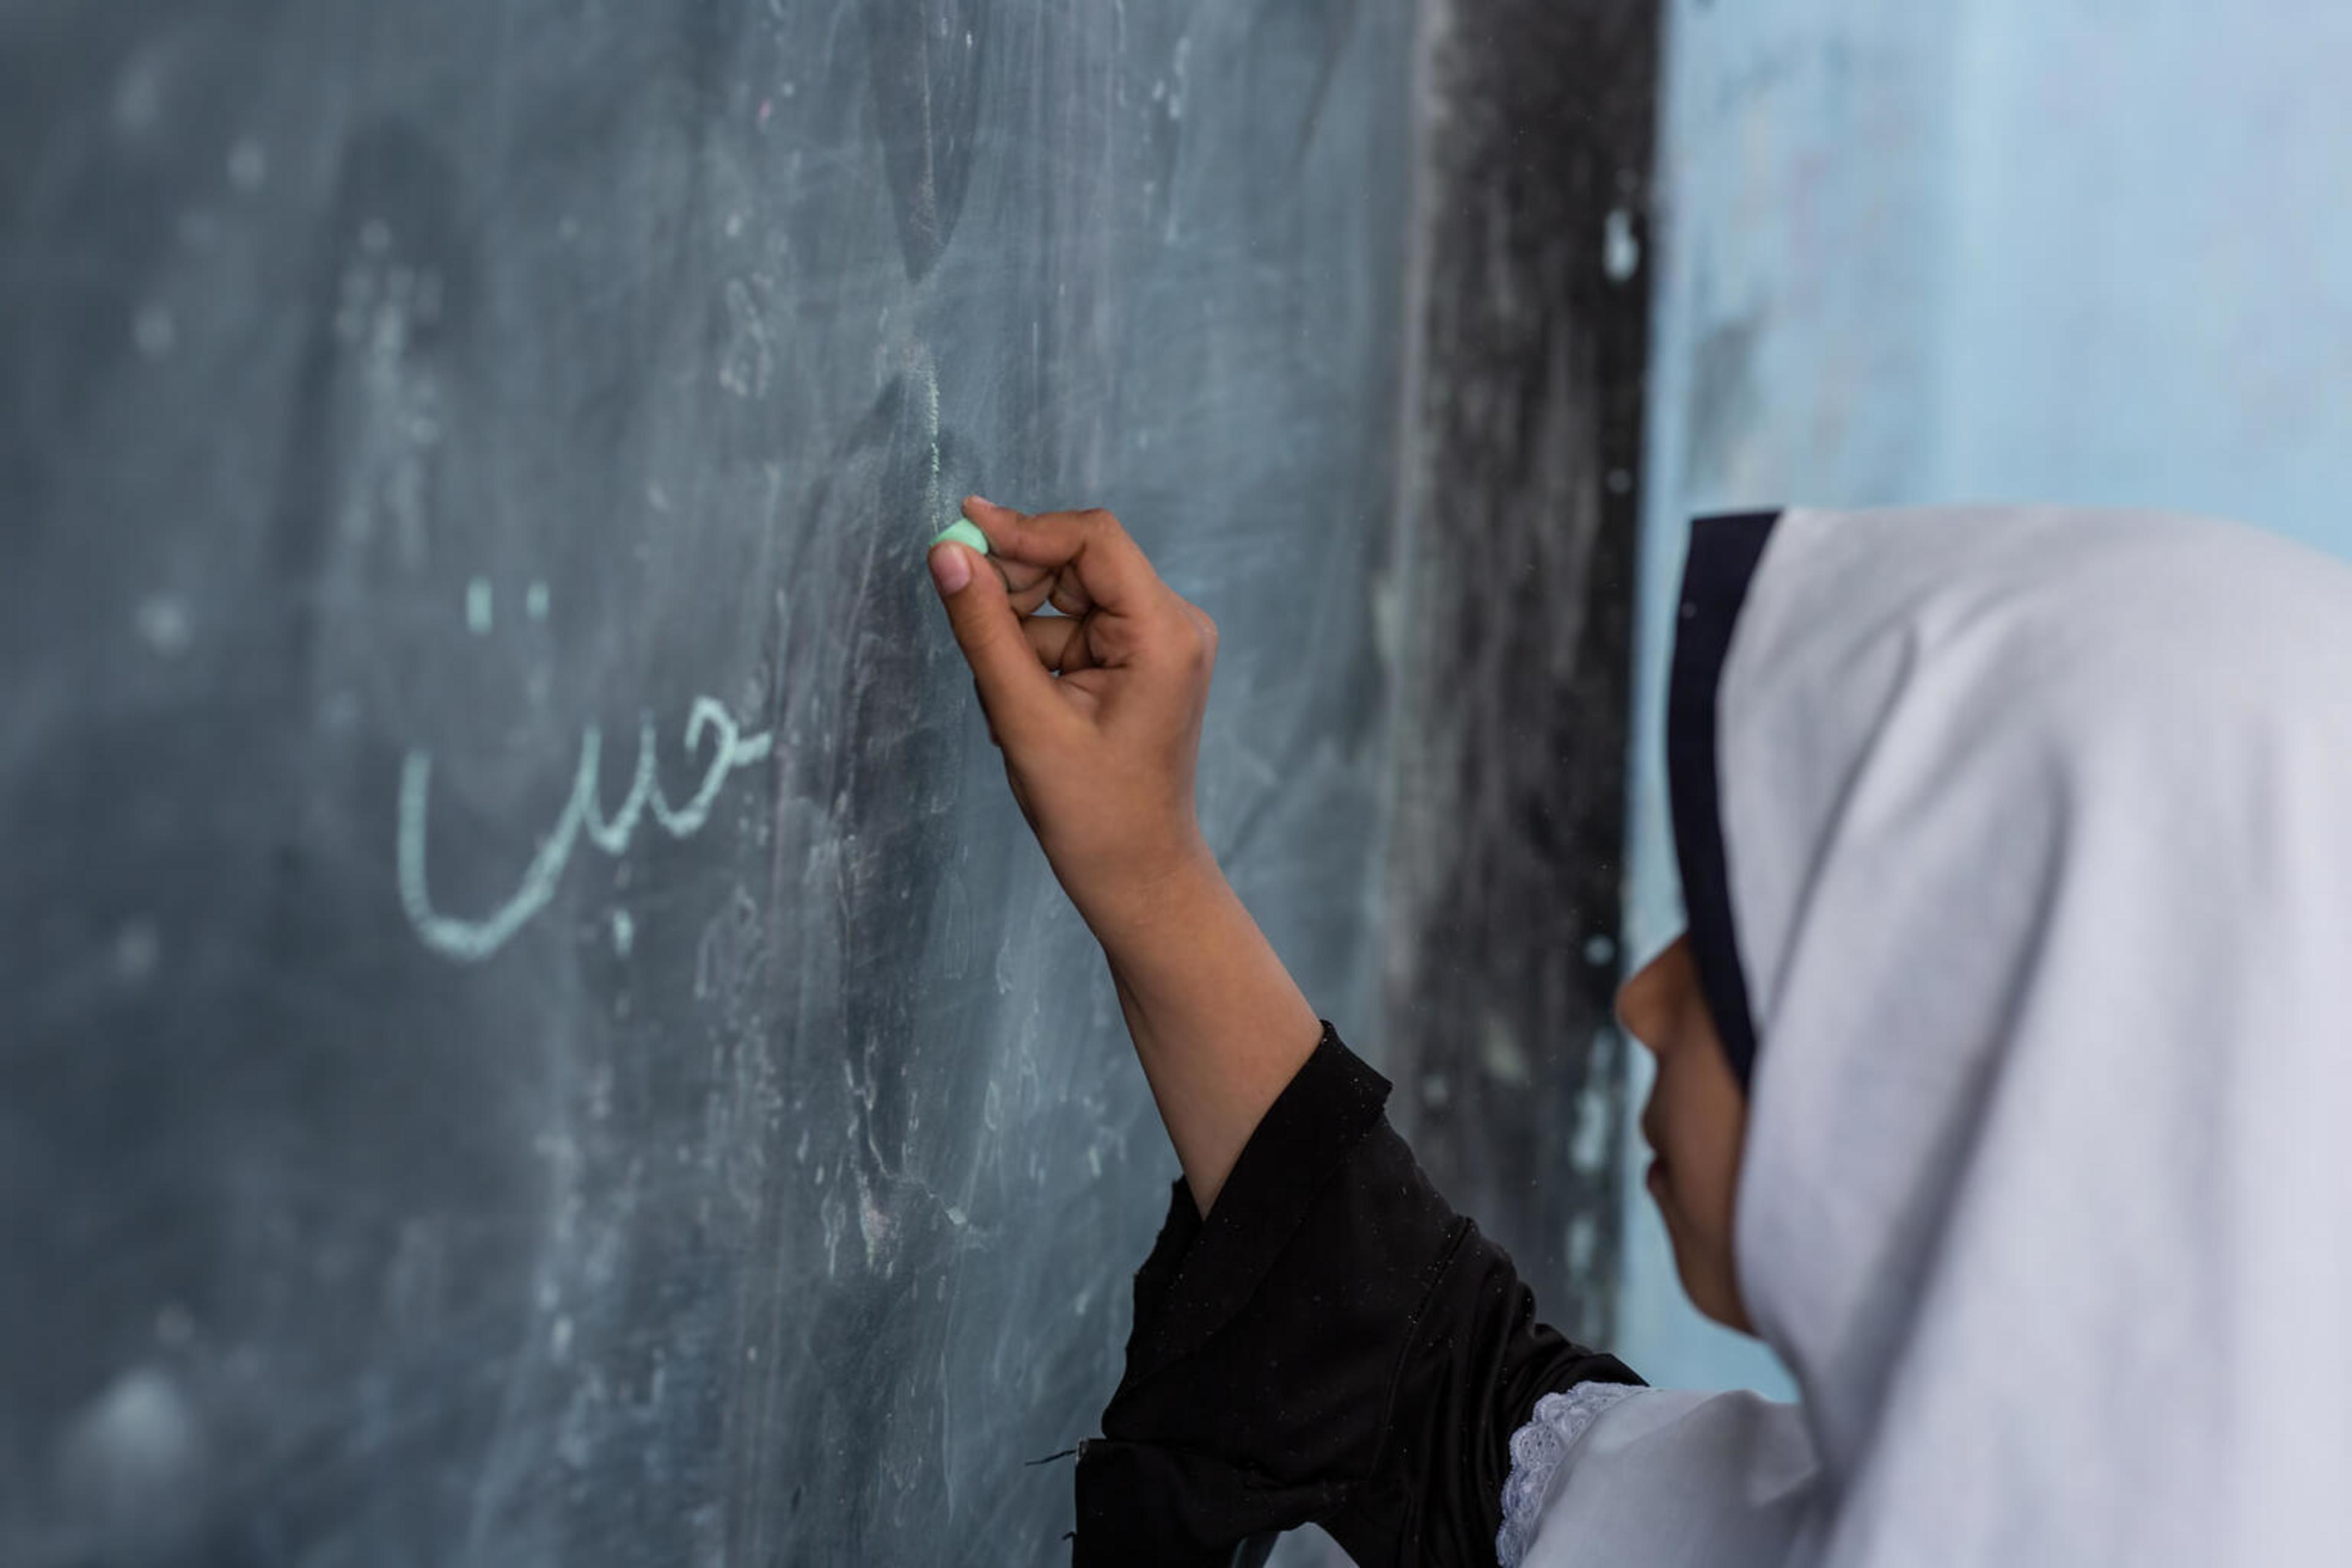 © UNICEF/UN0518460/Bidel